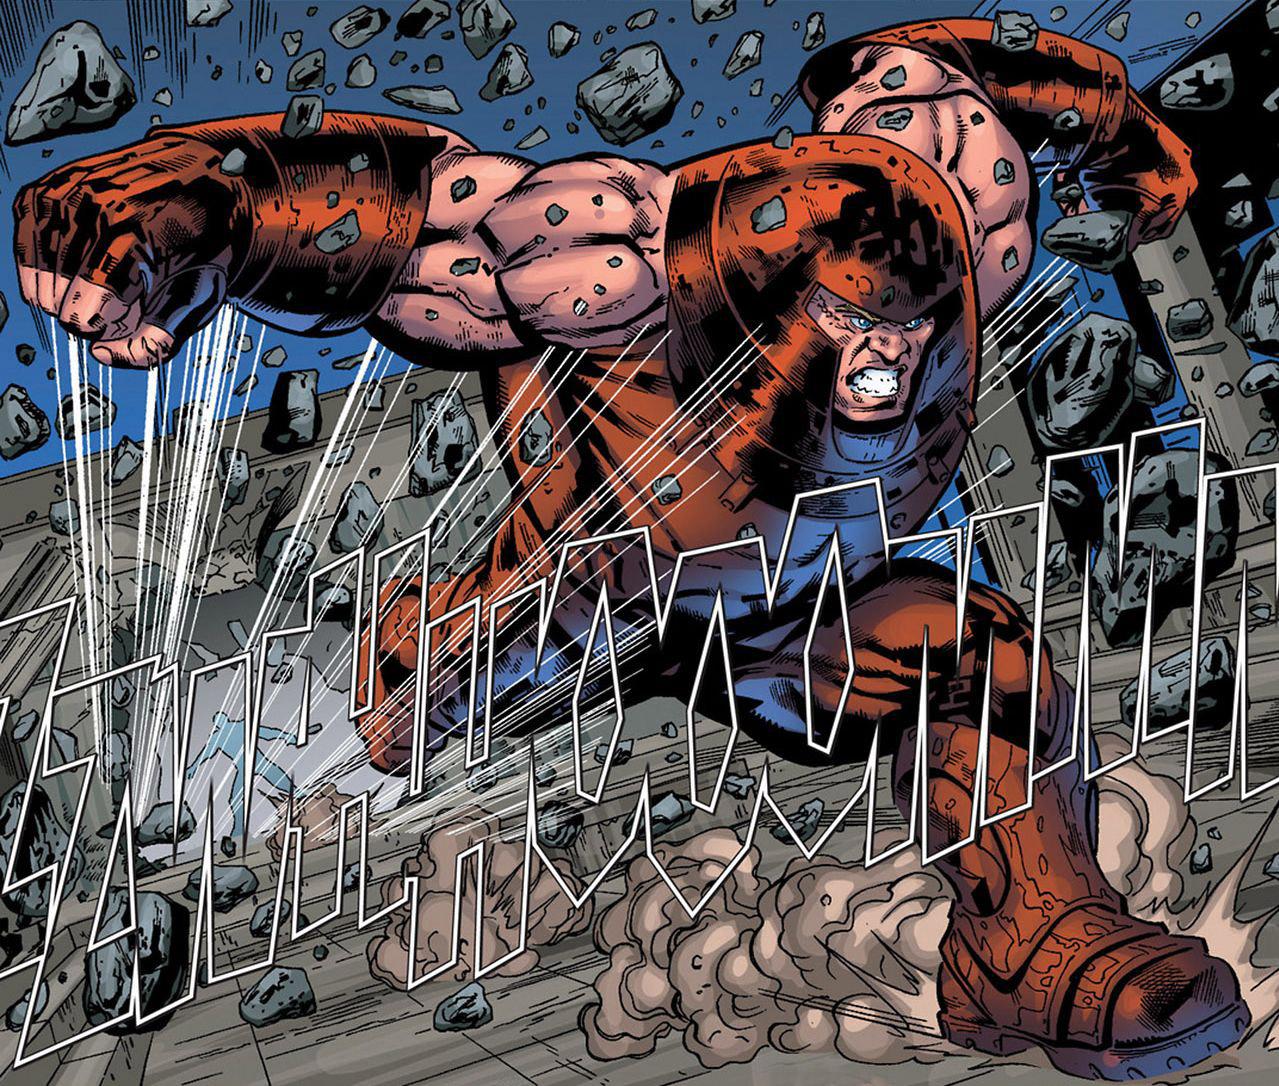 Cool Wallpaper Marvel Juggernaut - -Earth-616-Juggernaut-Cain-Marko-juggernaut-36830211-1279-1086  Pictures_65649.jpg